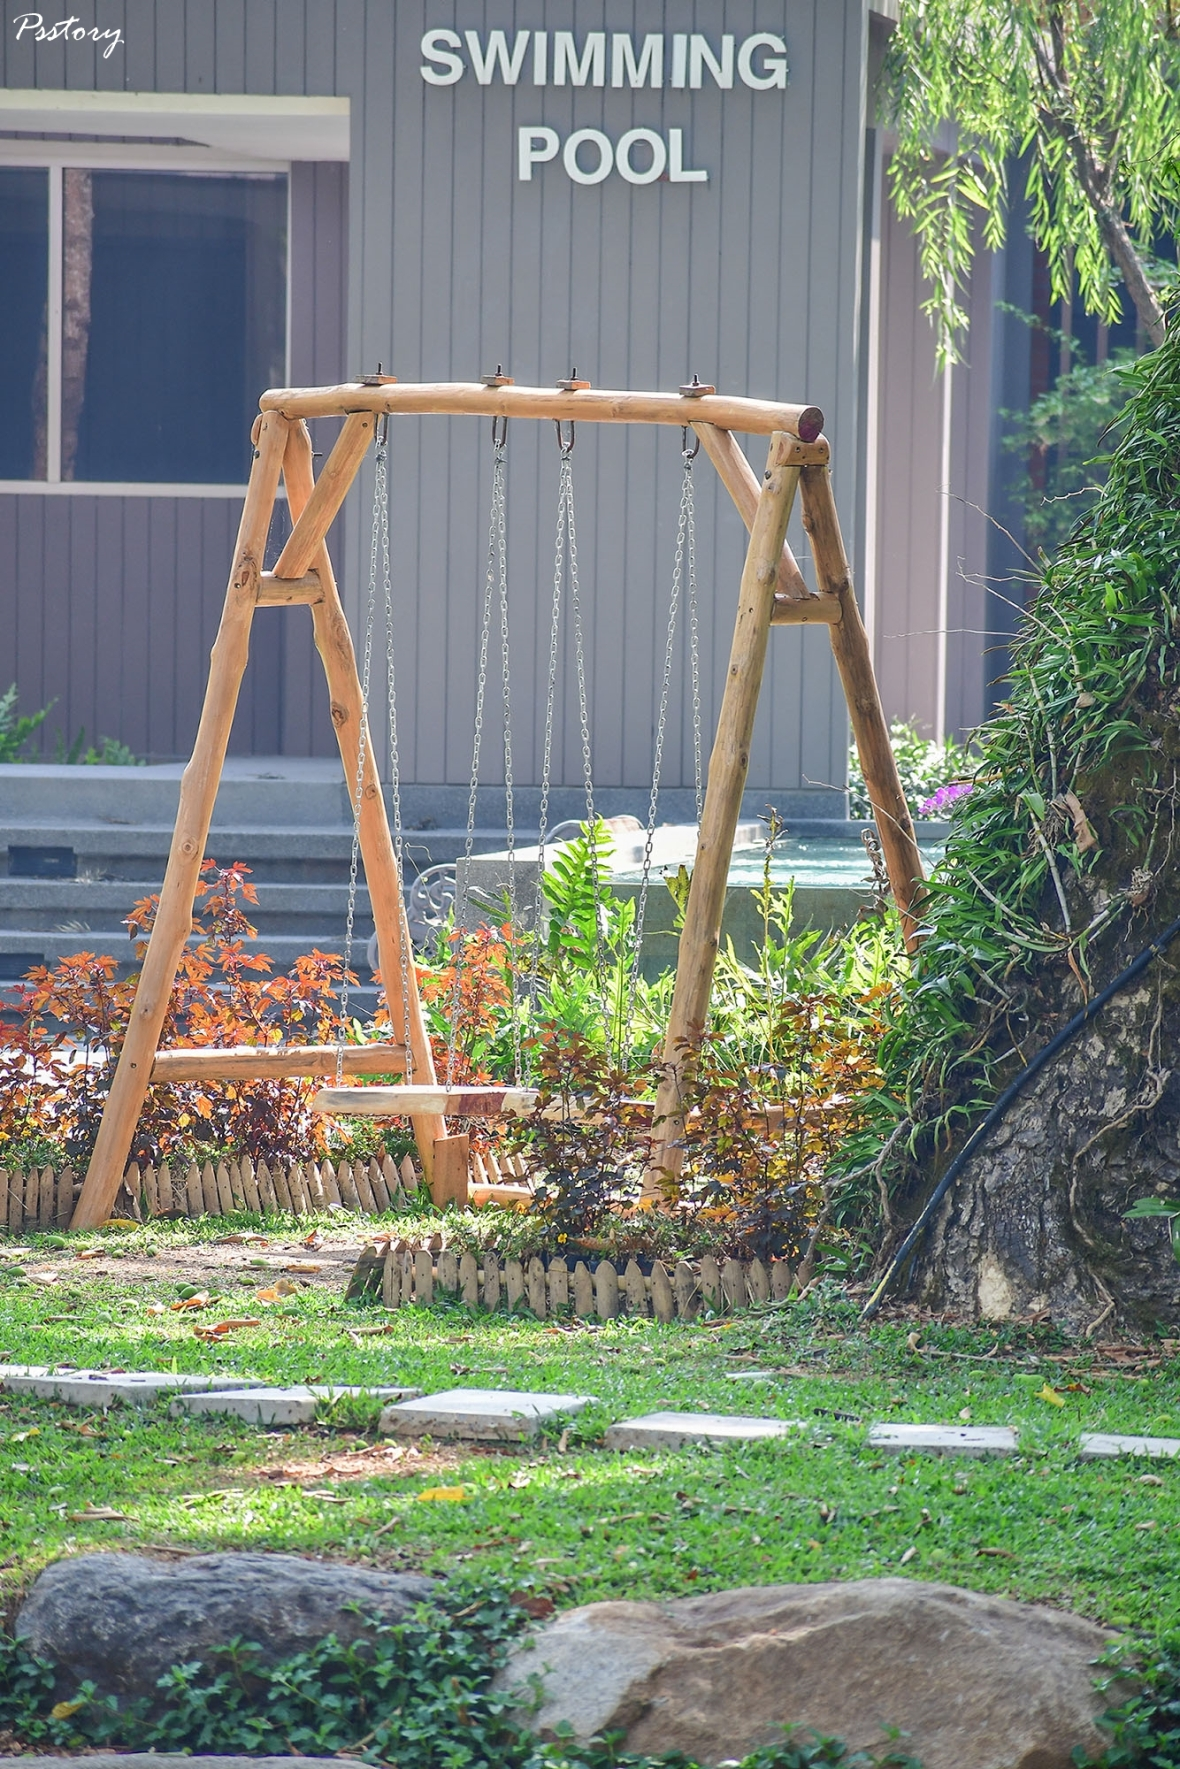 Flora Creek Chiang Mai (106)